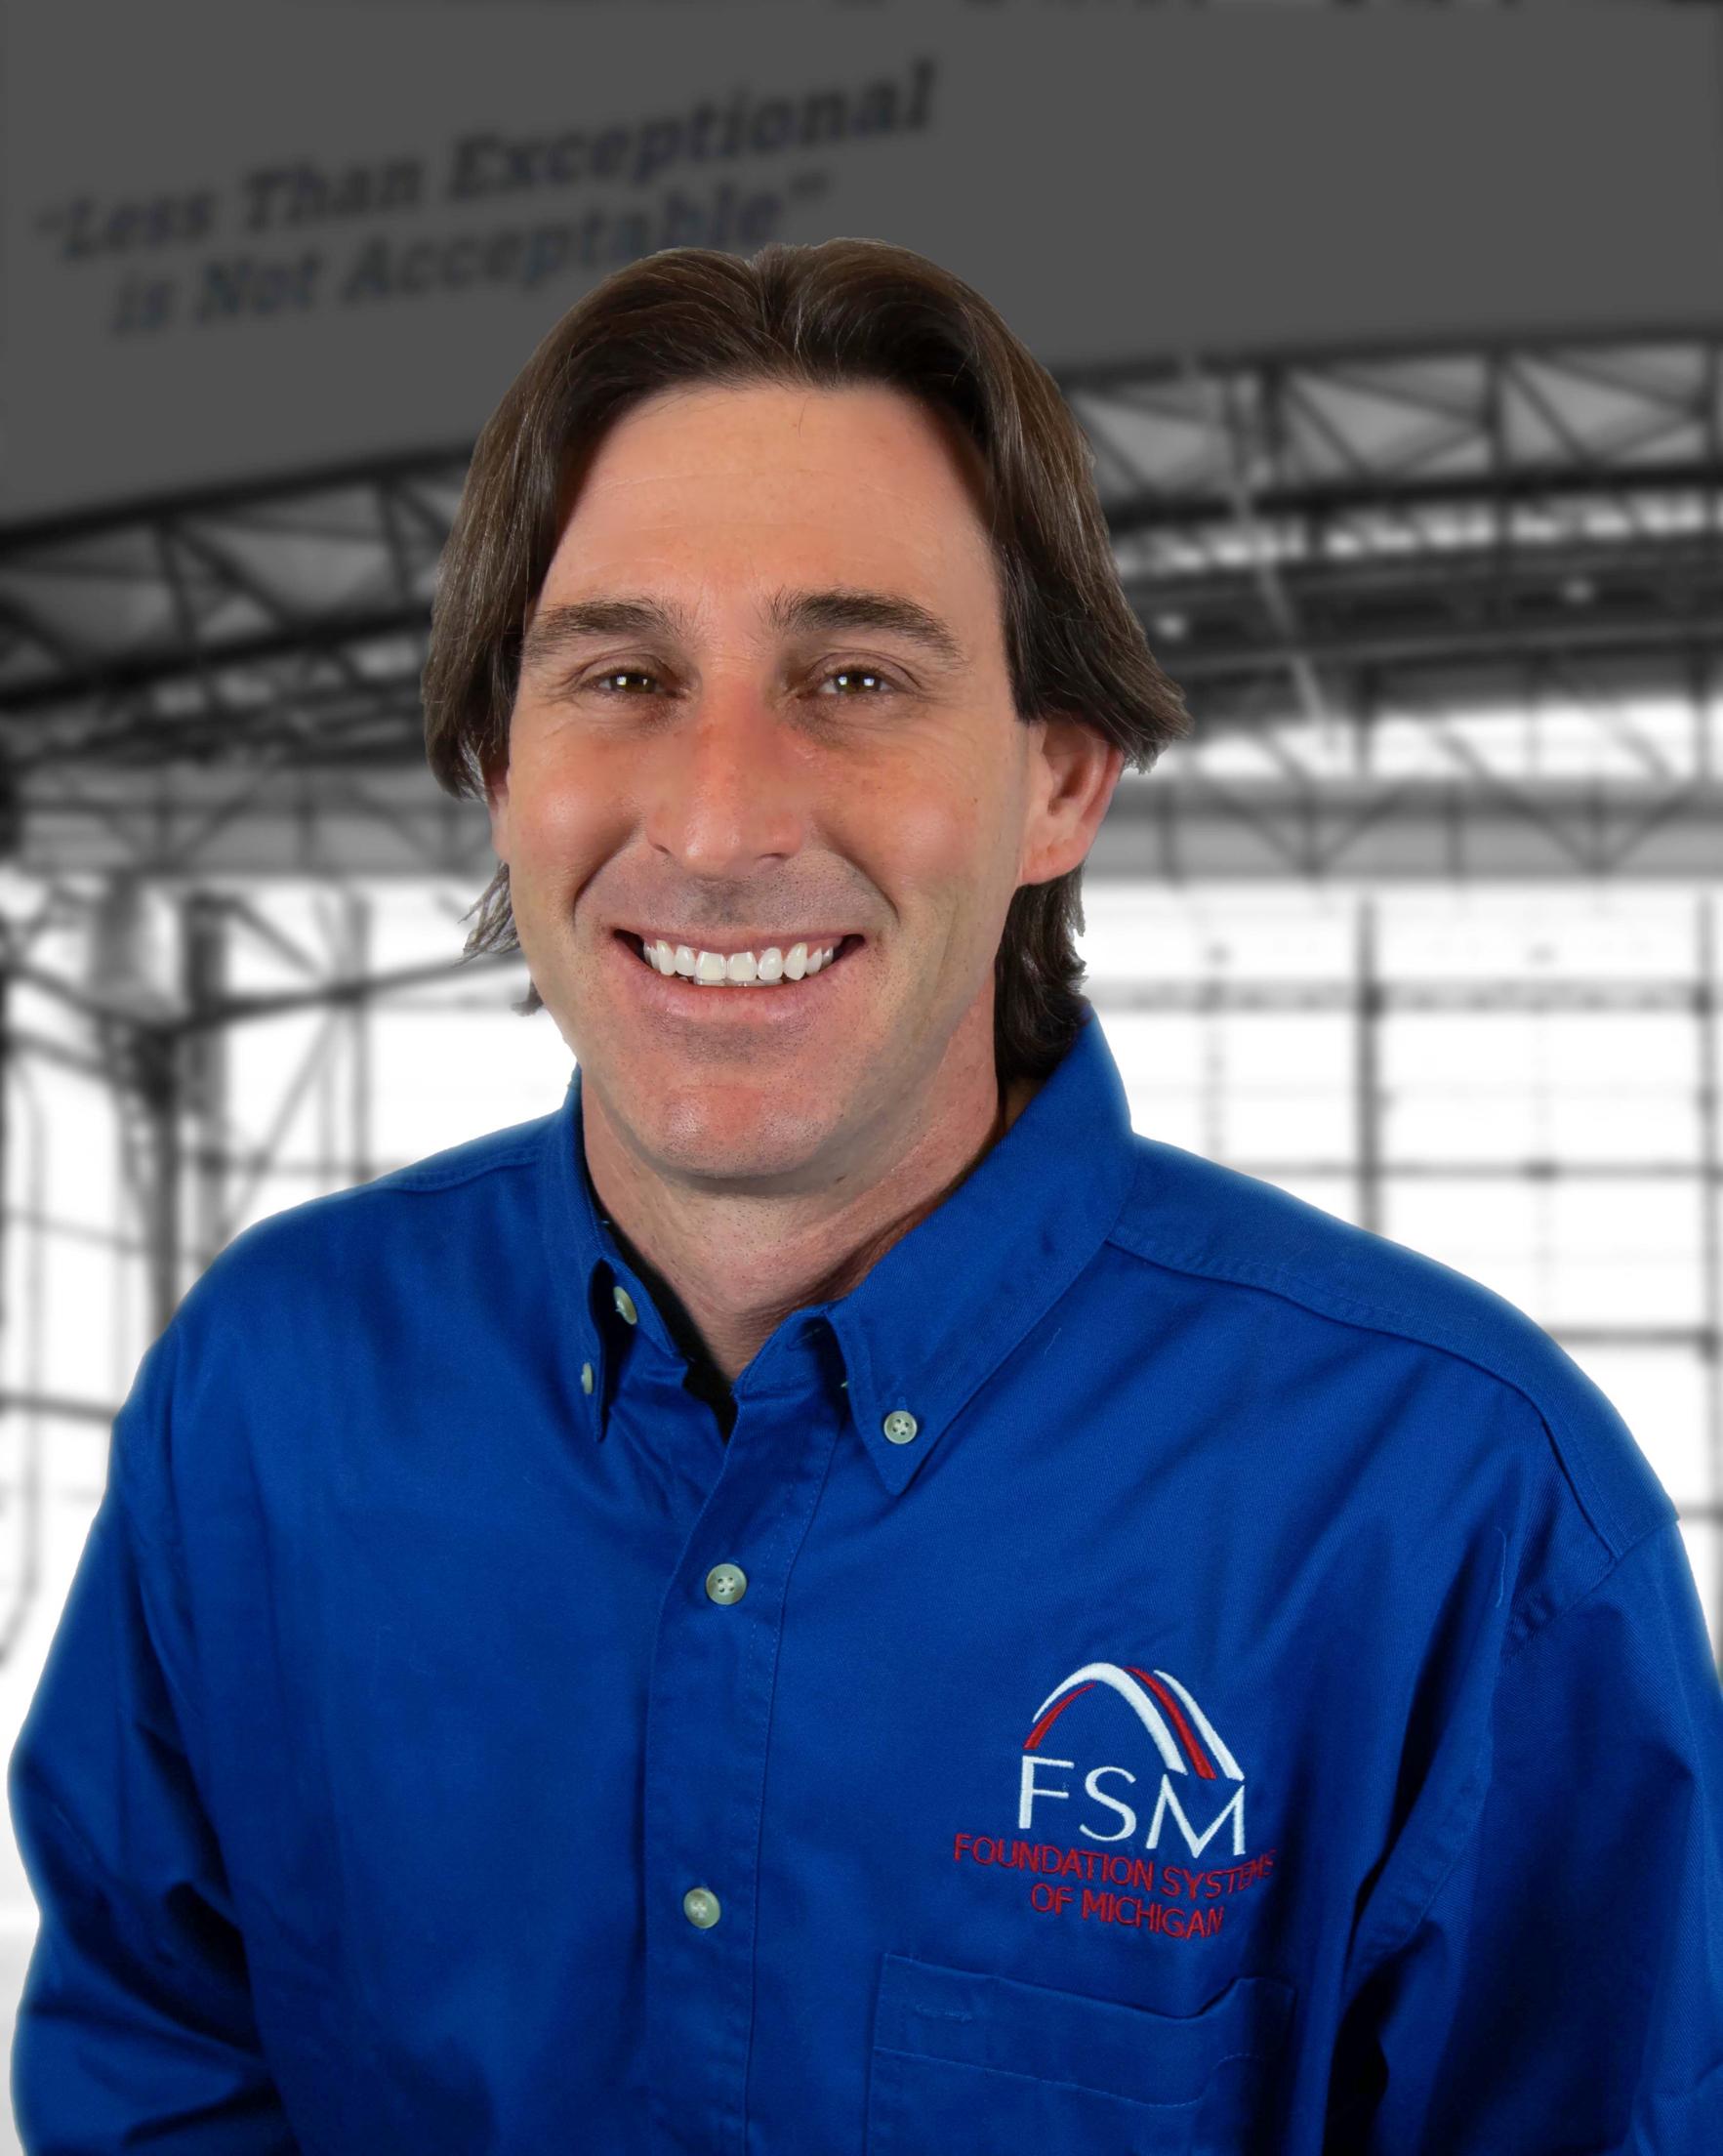 FSM Mike Carpenter II Master Electrician